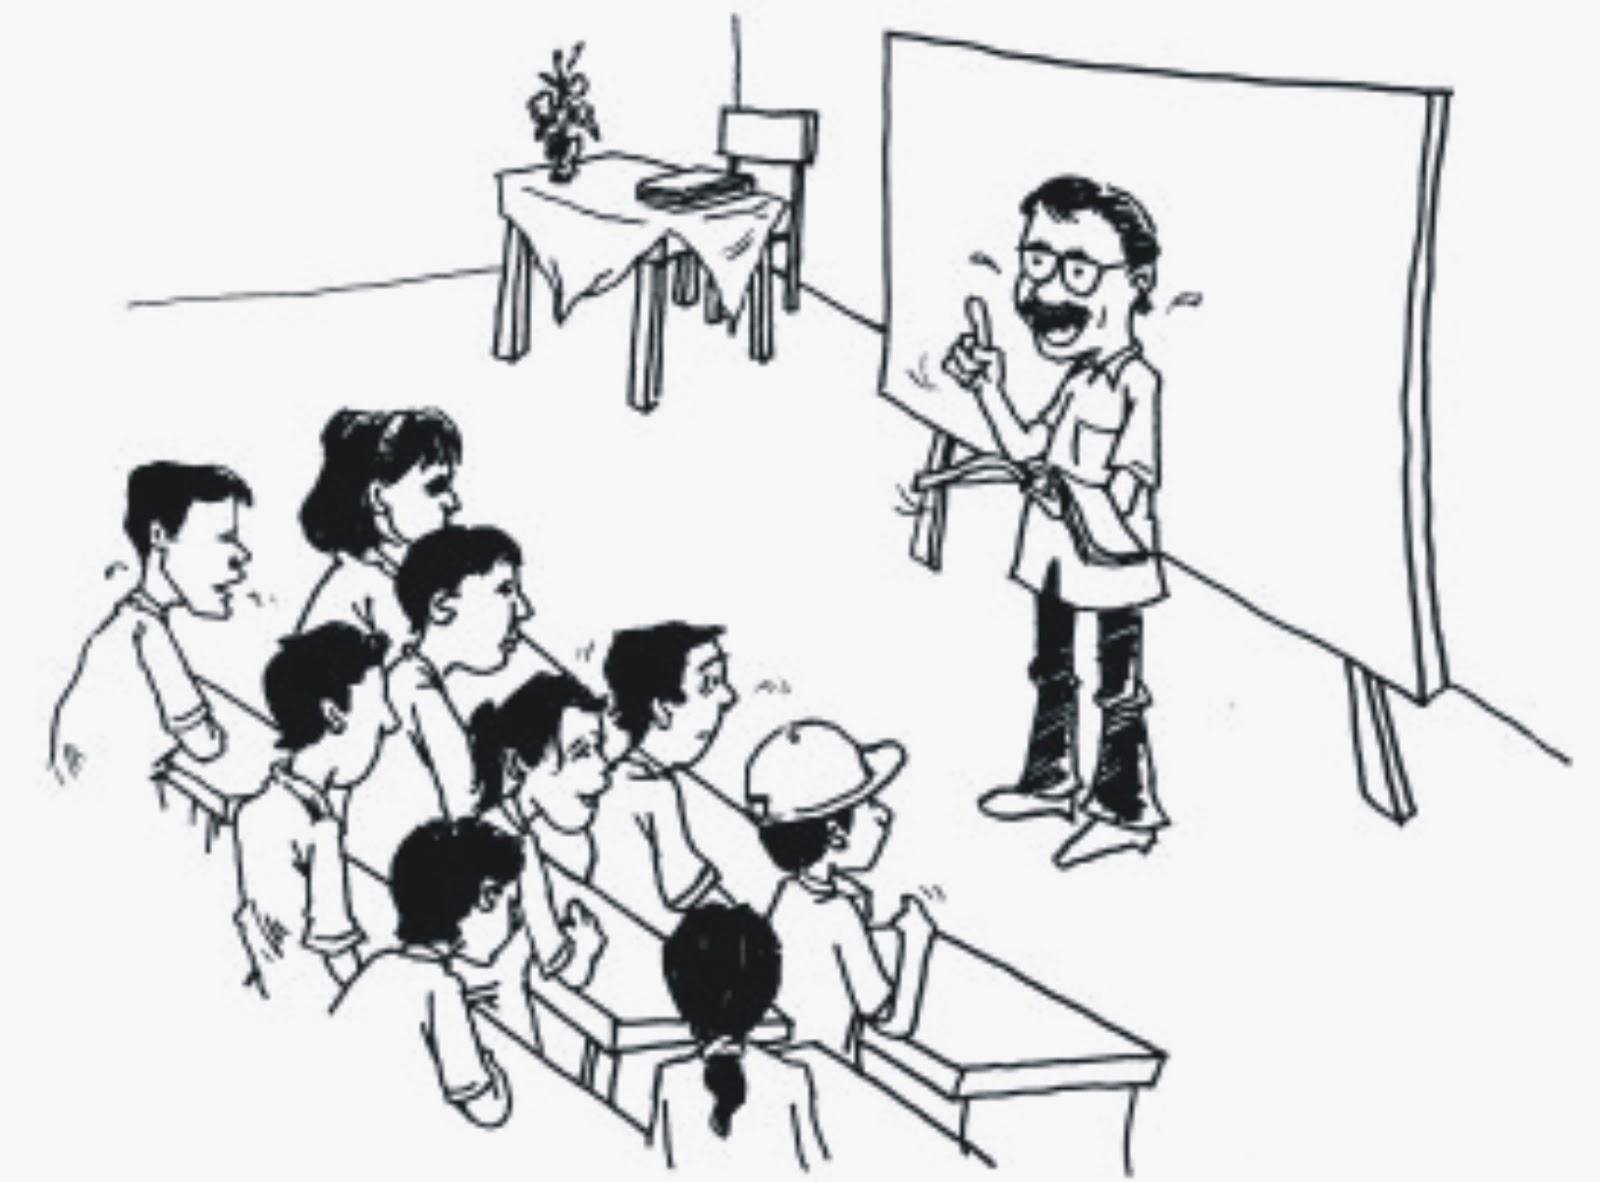 99 Gambar Guru Mengajar Animasi Hitam Putih Terbaru Cikimm Com